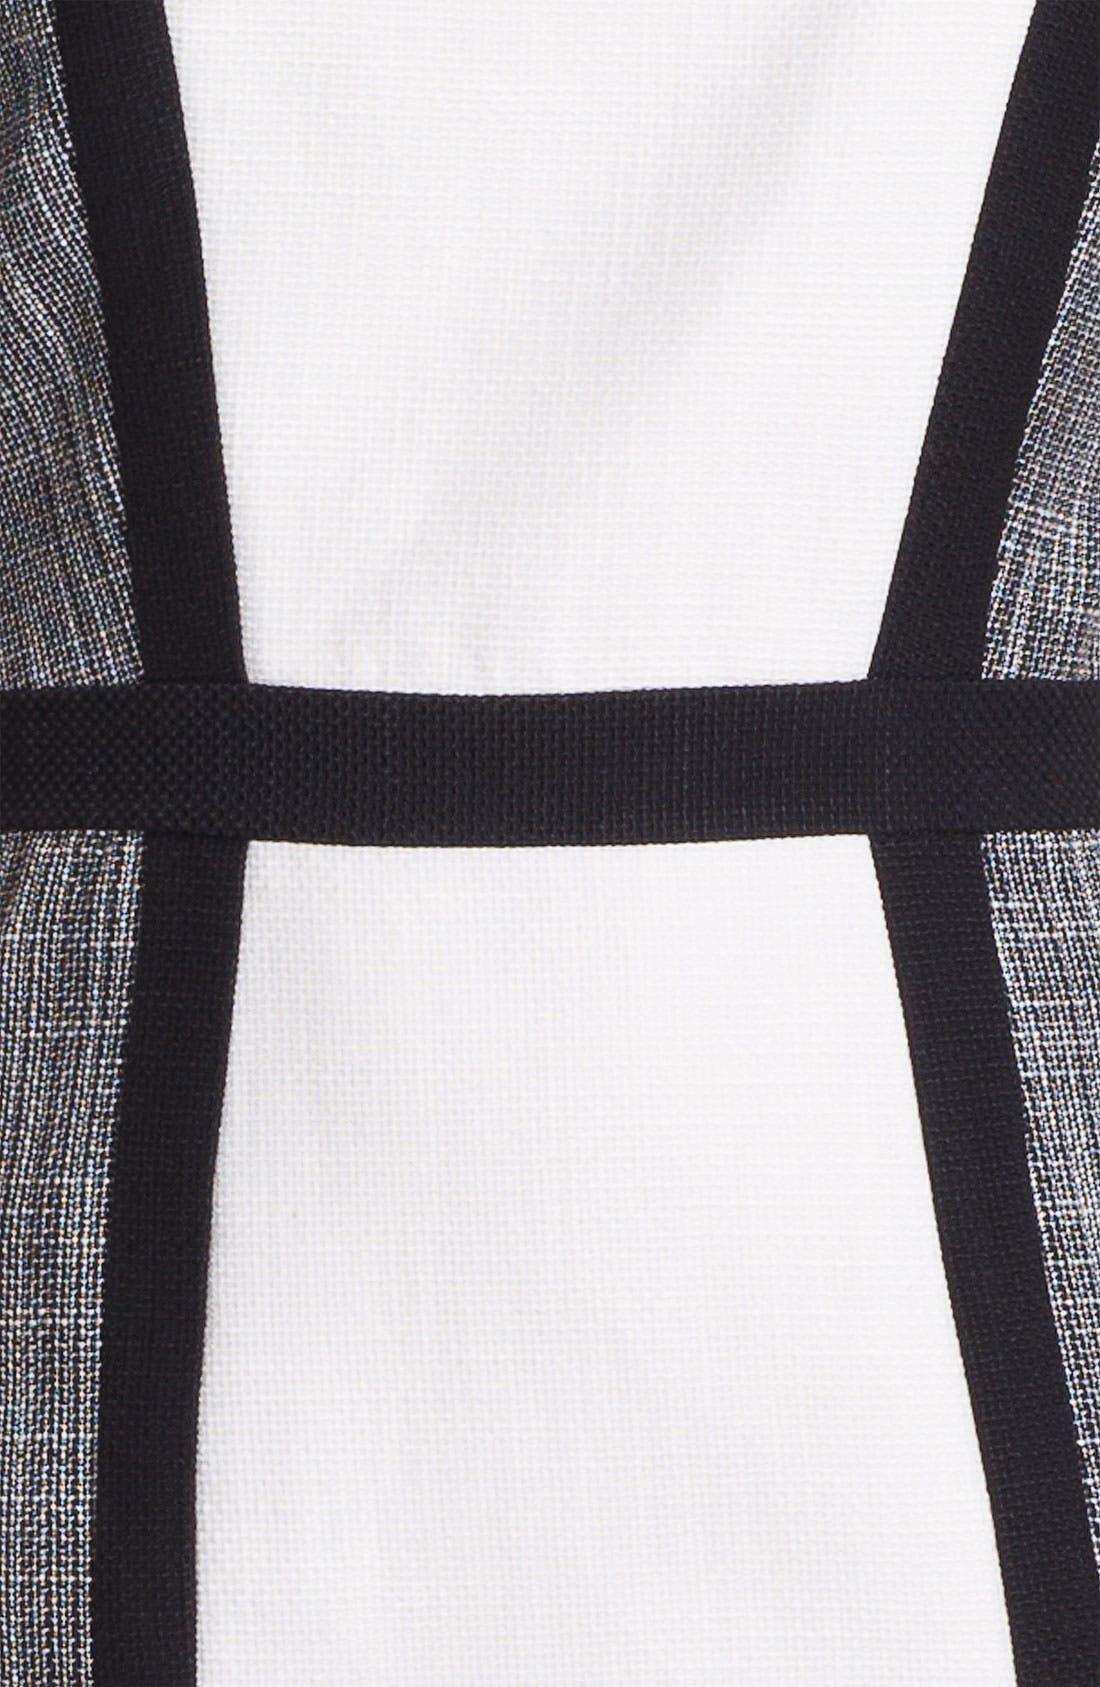 Alternate Image 3  - Calvin Klein Colorblock Panel Dress